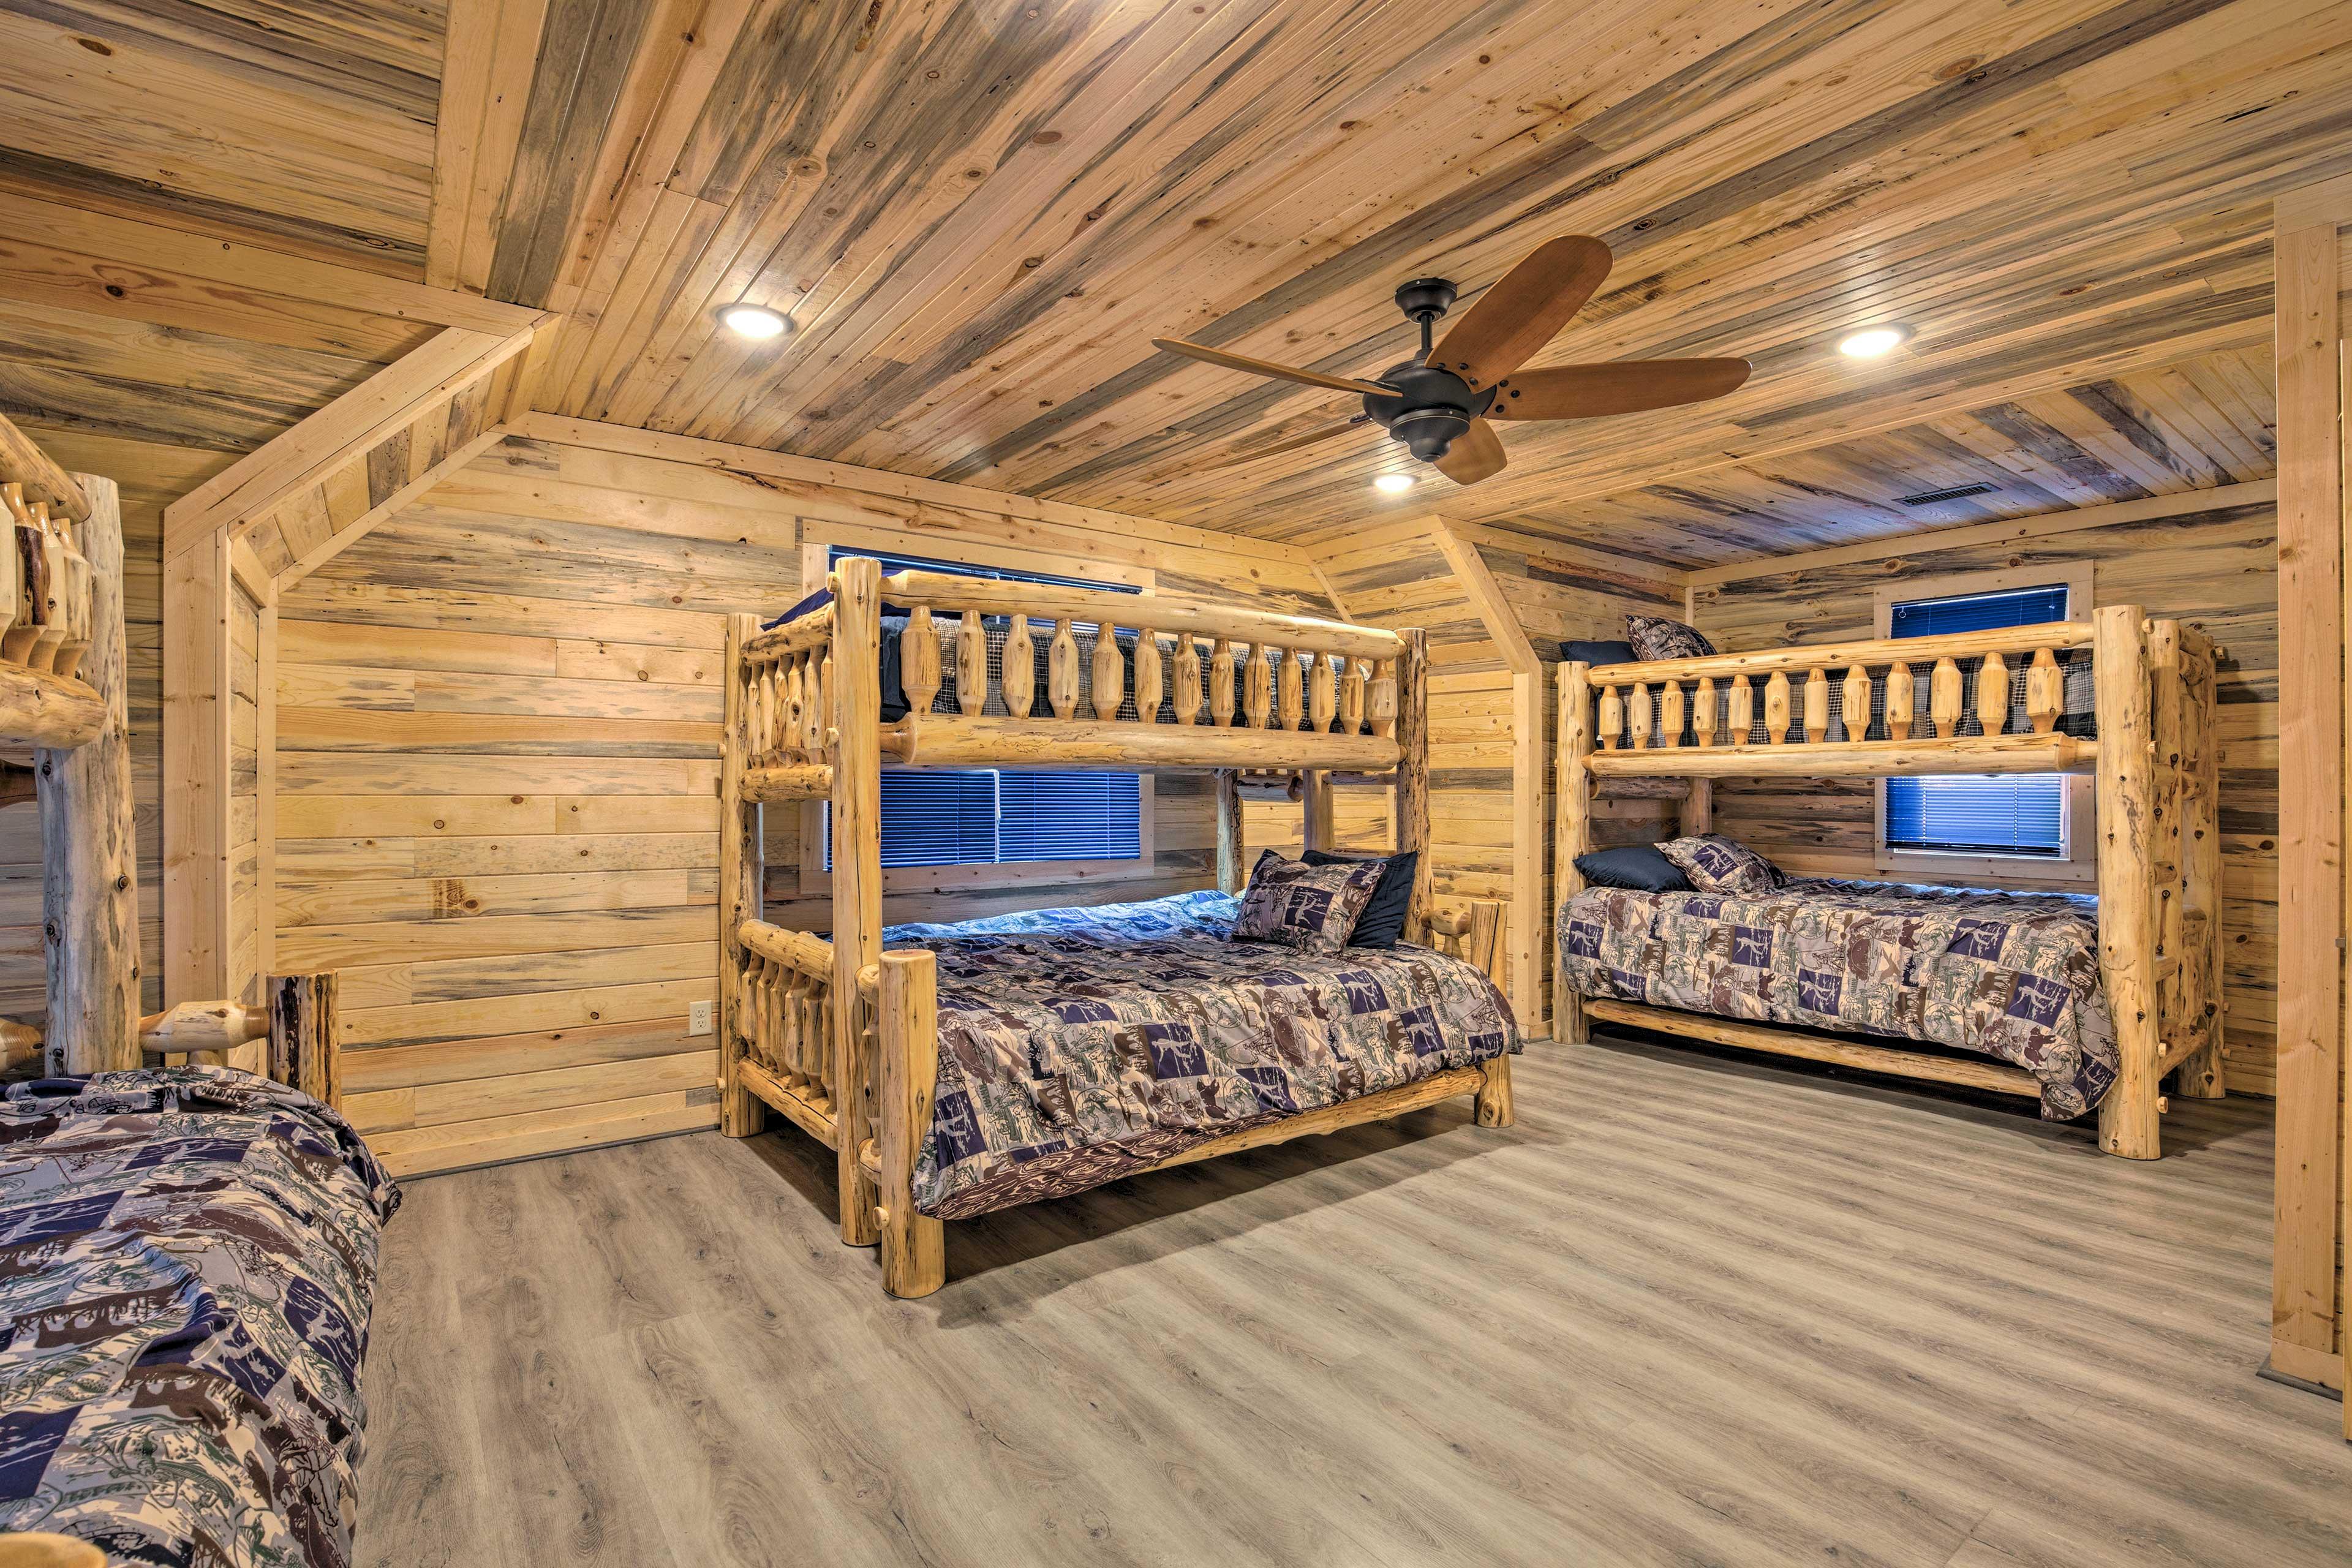 This bedroom sleeps 8 guests.